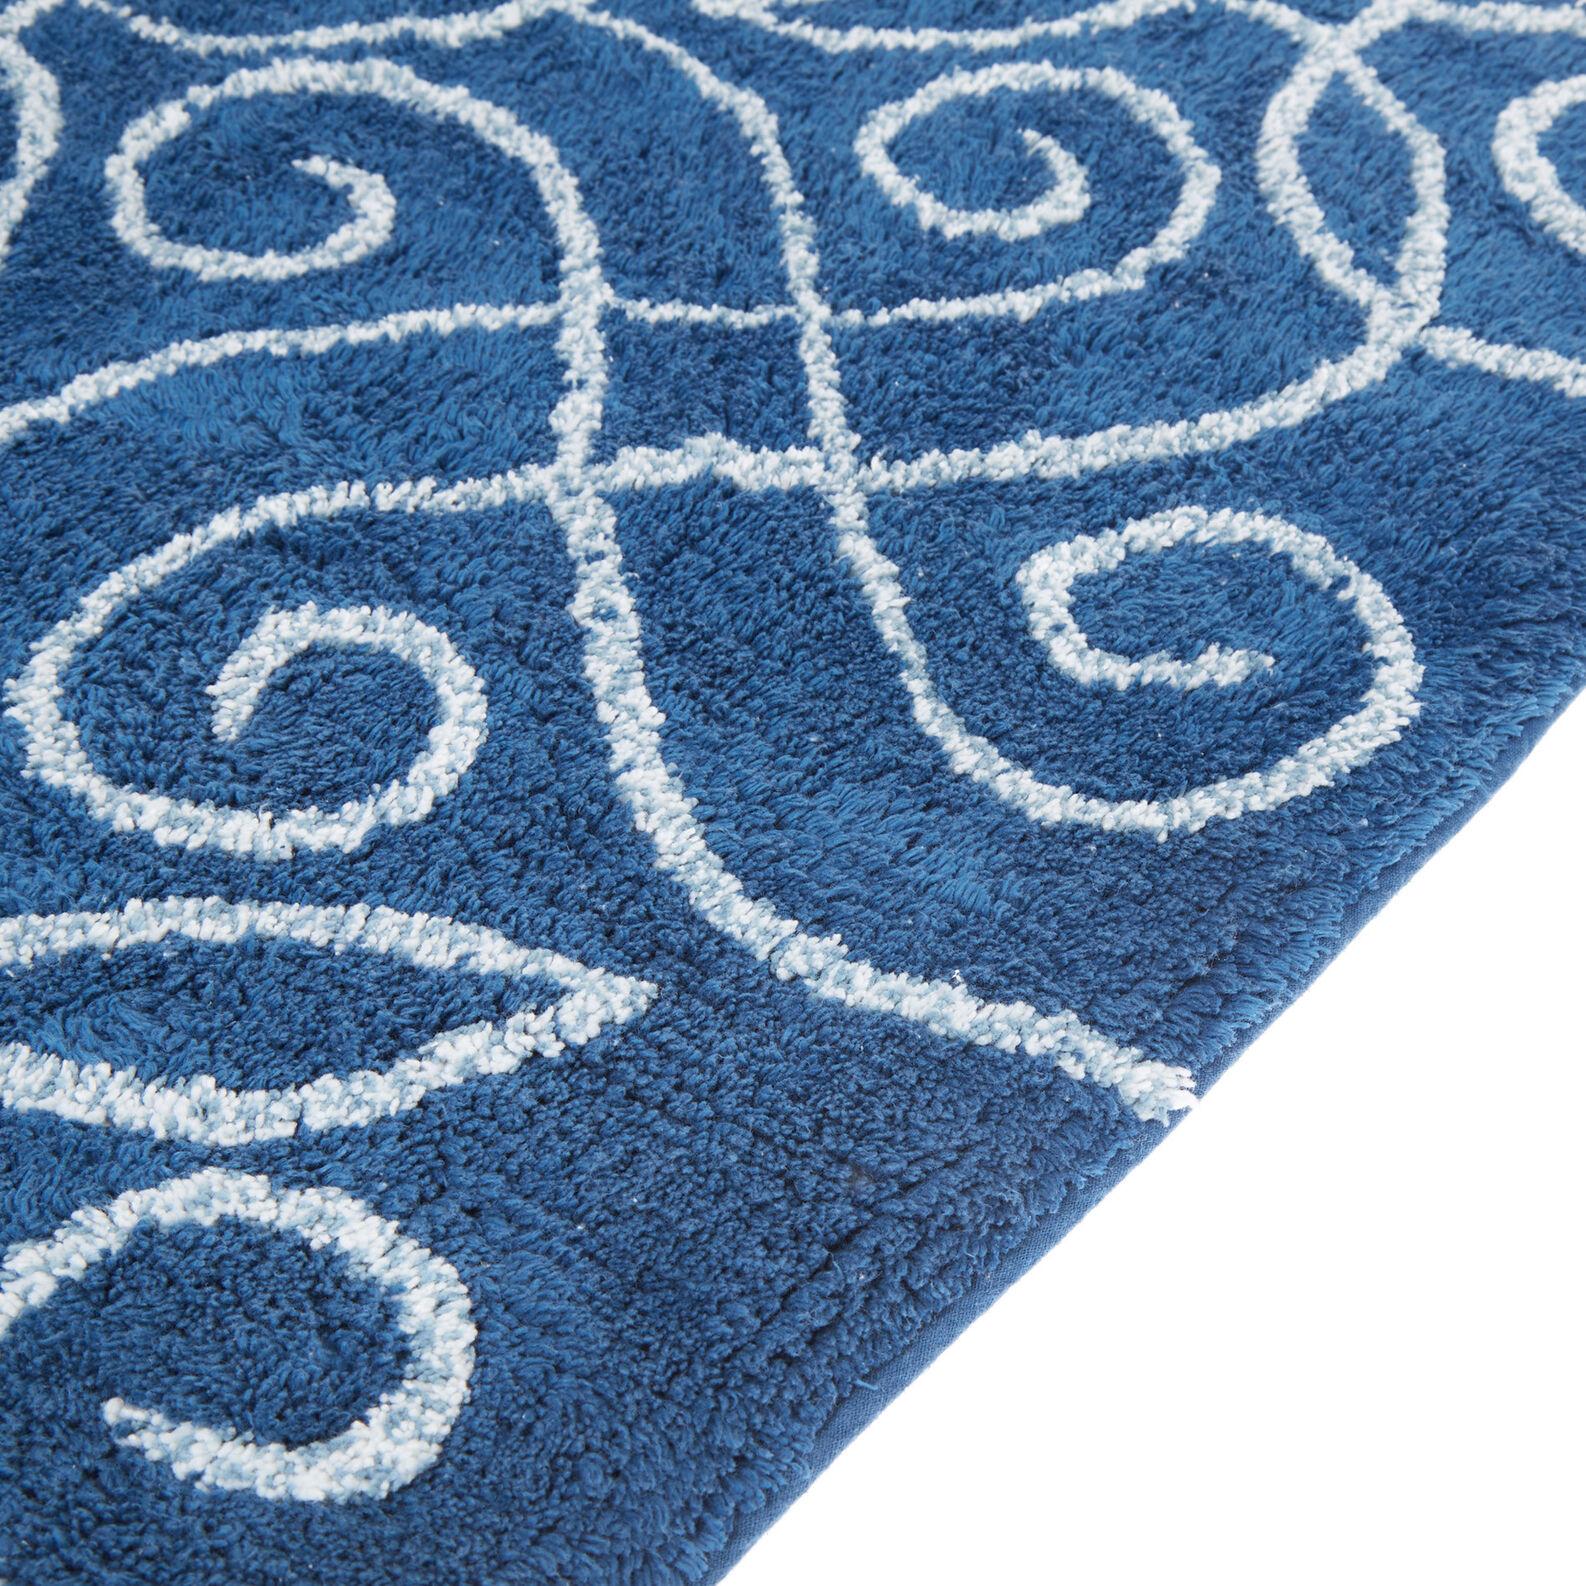 100% cotton bath mat with damask motif